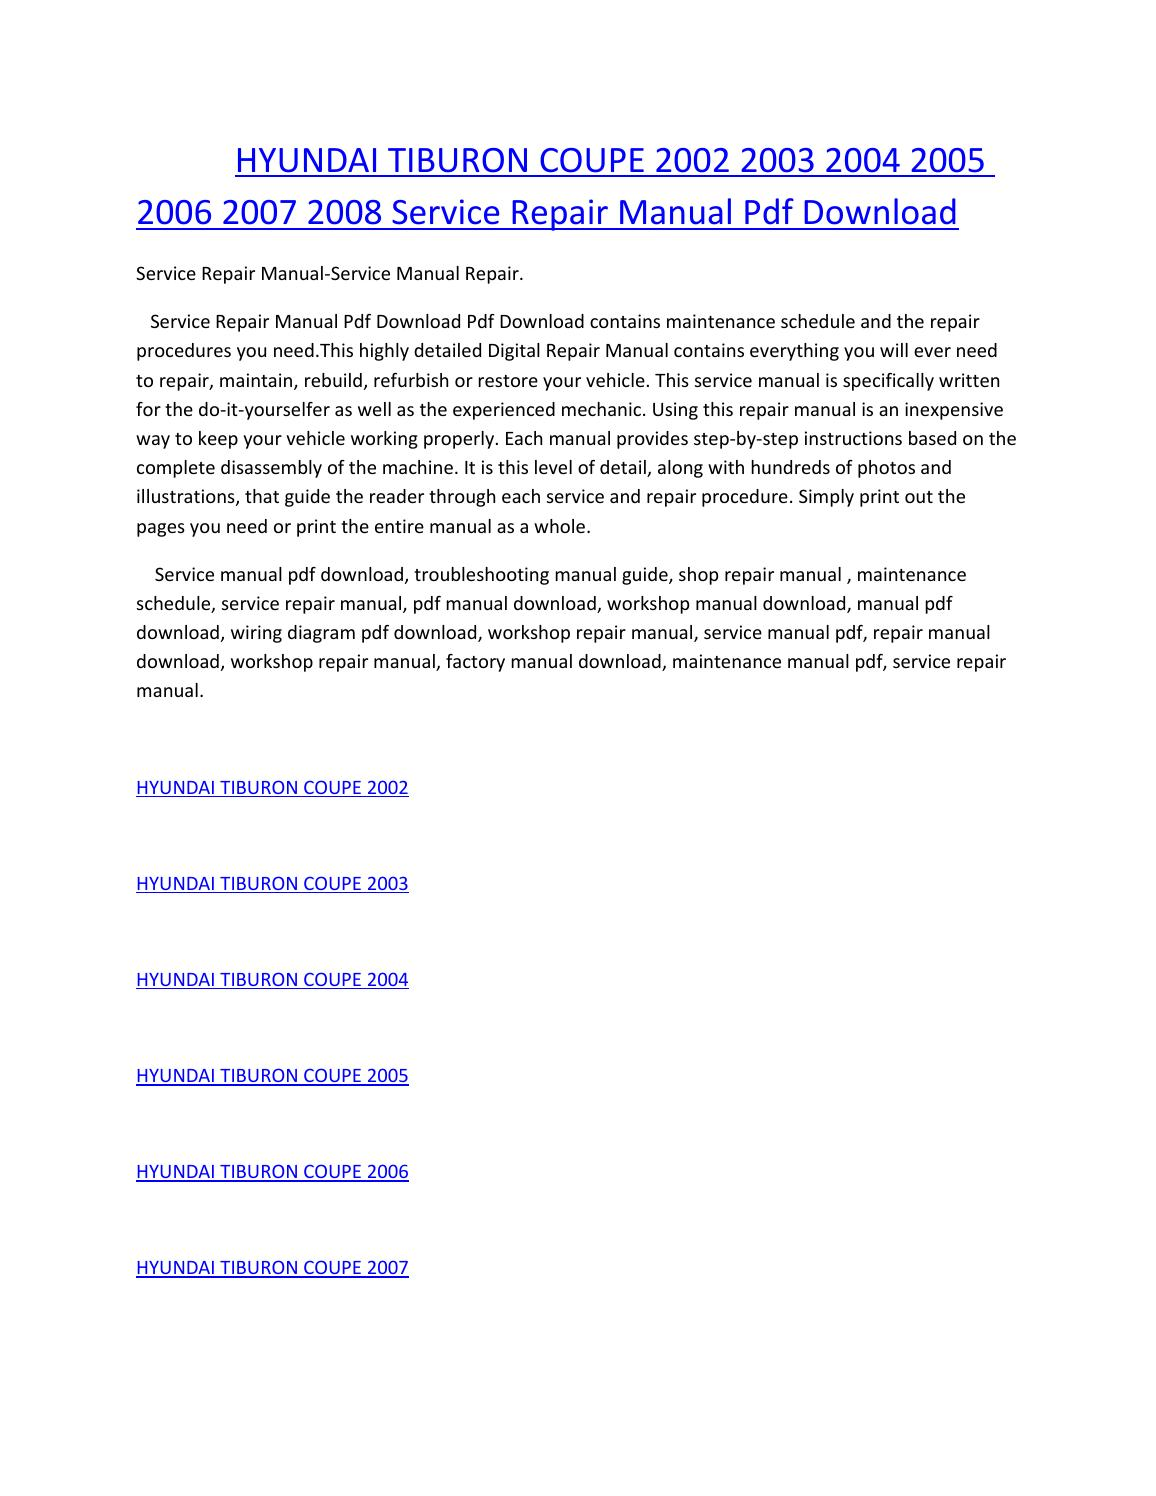 Hyundai tiburon coupe 2002 2003 2004 2005 2006 2007 2008 service manual  repair pdf download by amurgului - issuu